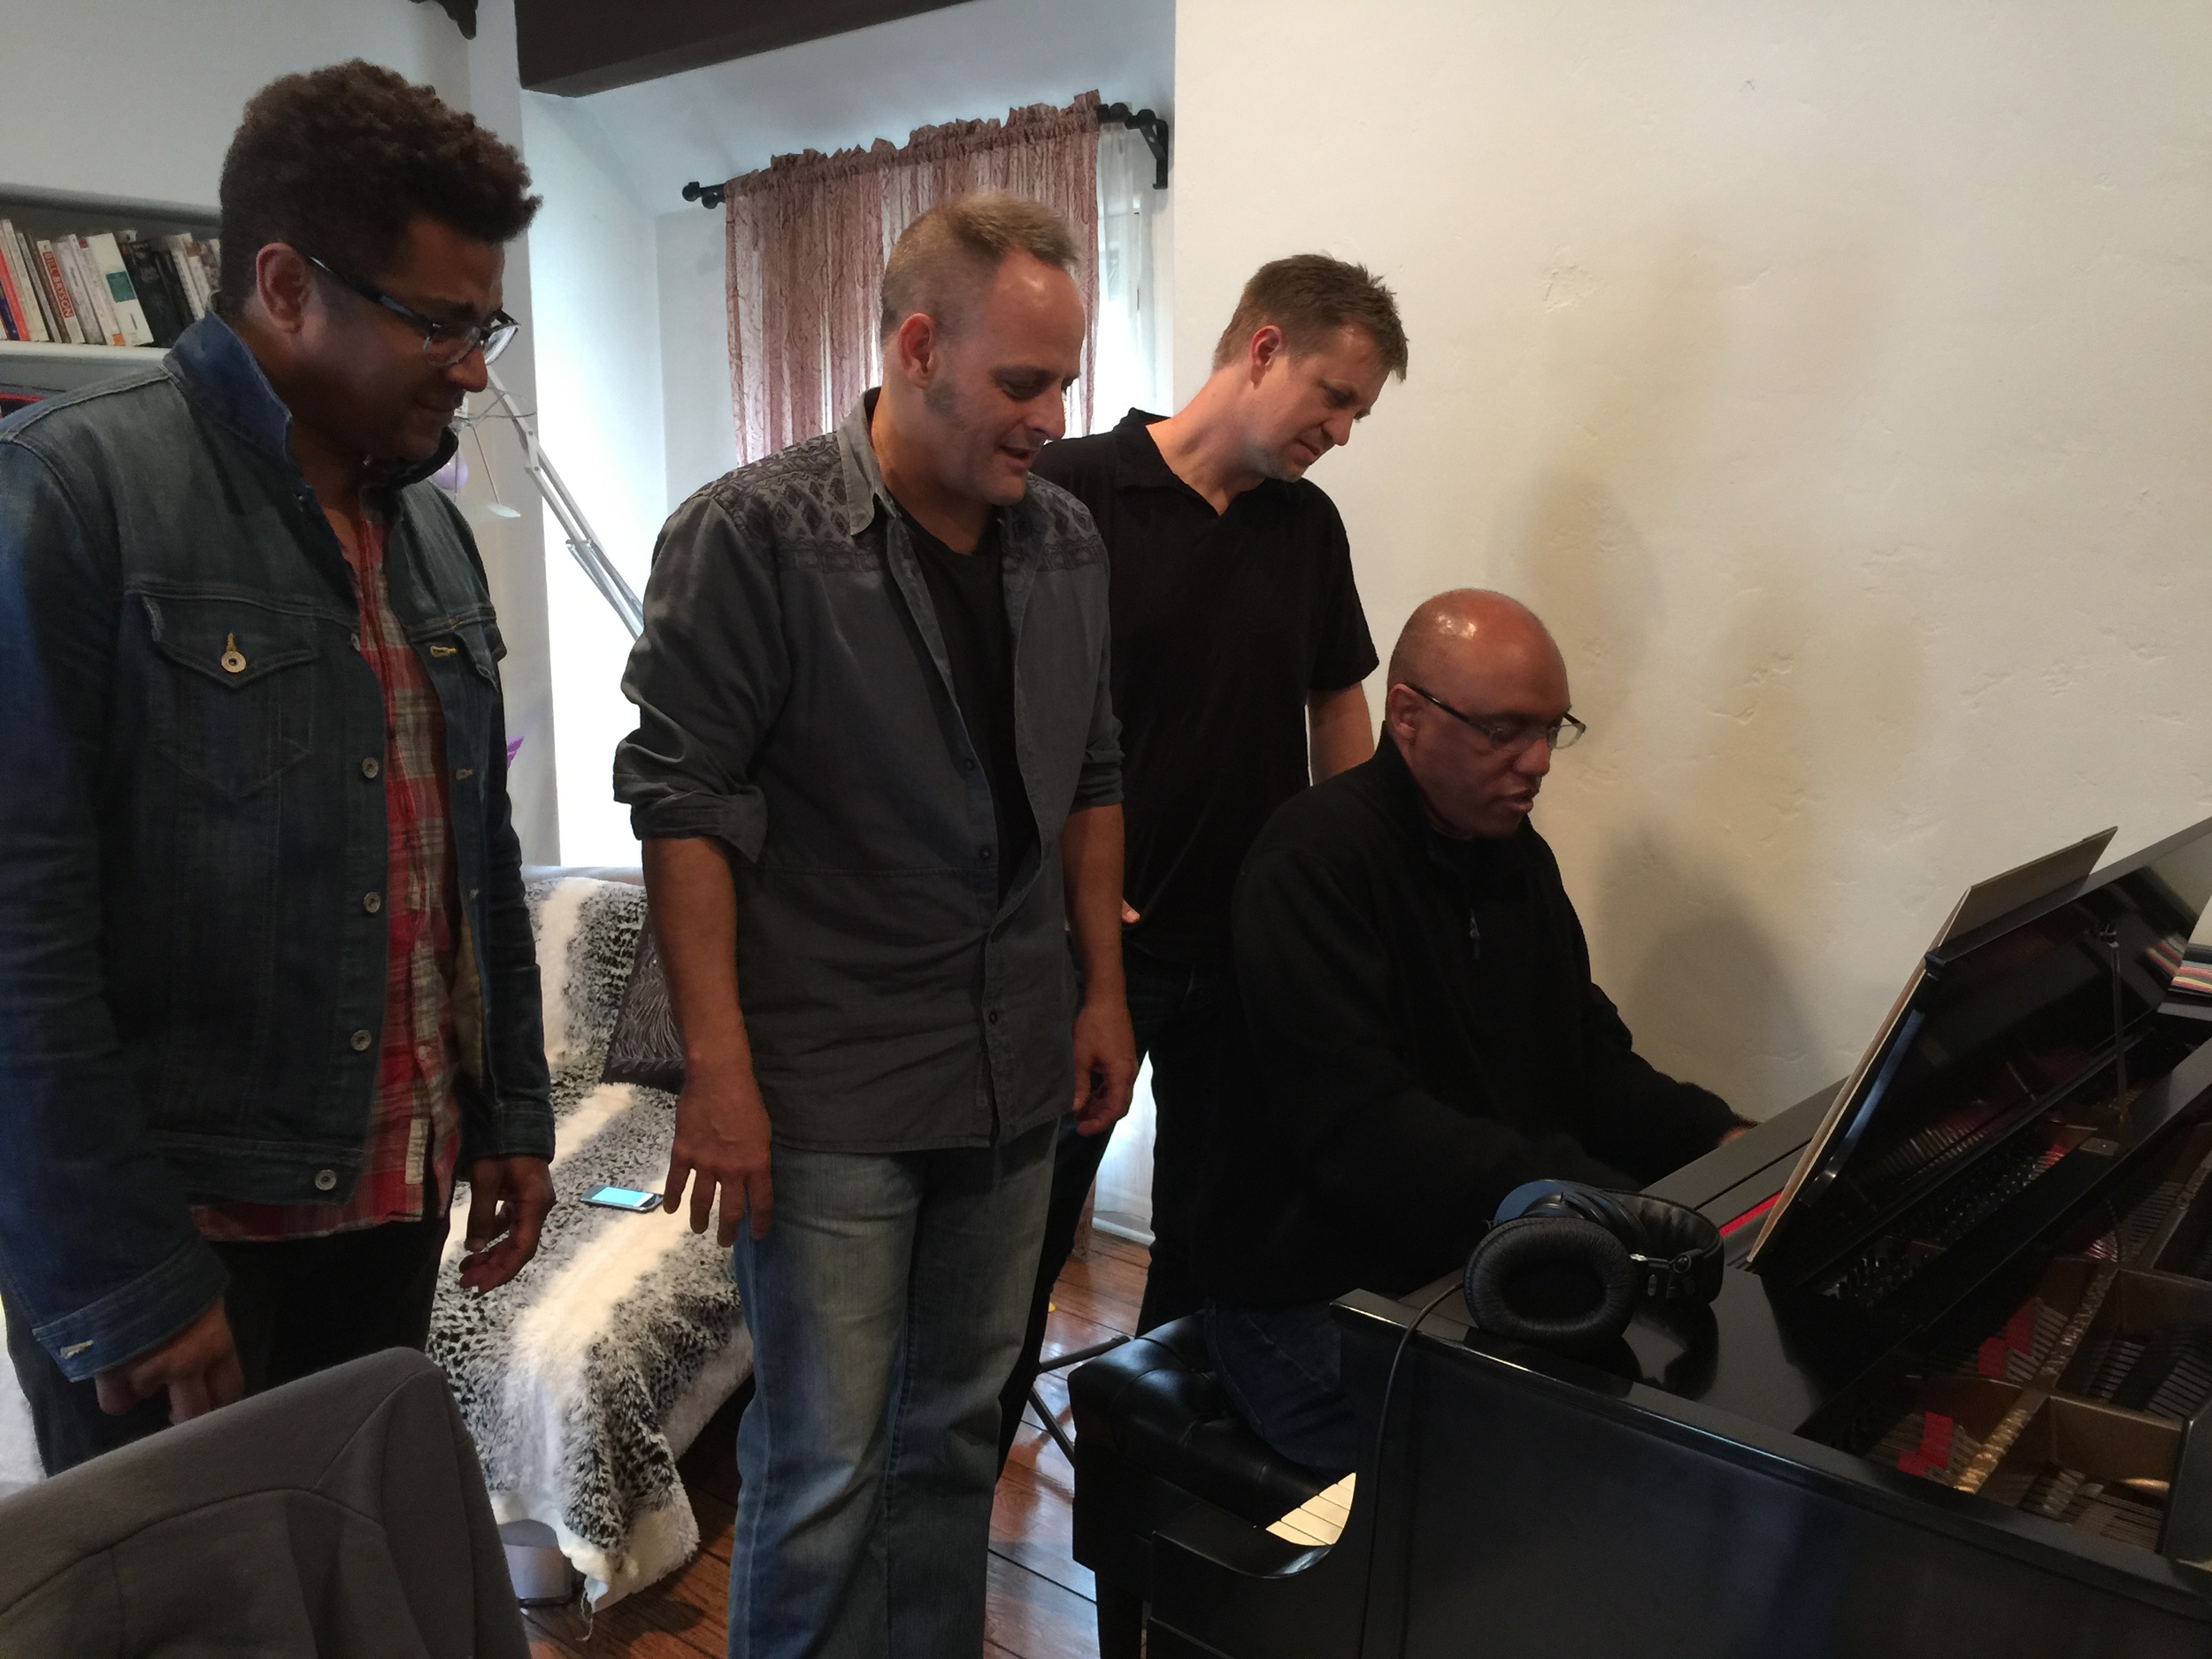 Caffeinated Keyboardist podcast recording w/ Deron Johnson, Scott Healy & Billy Childs